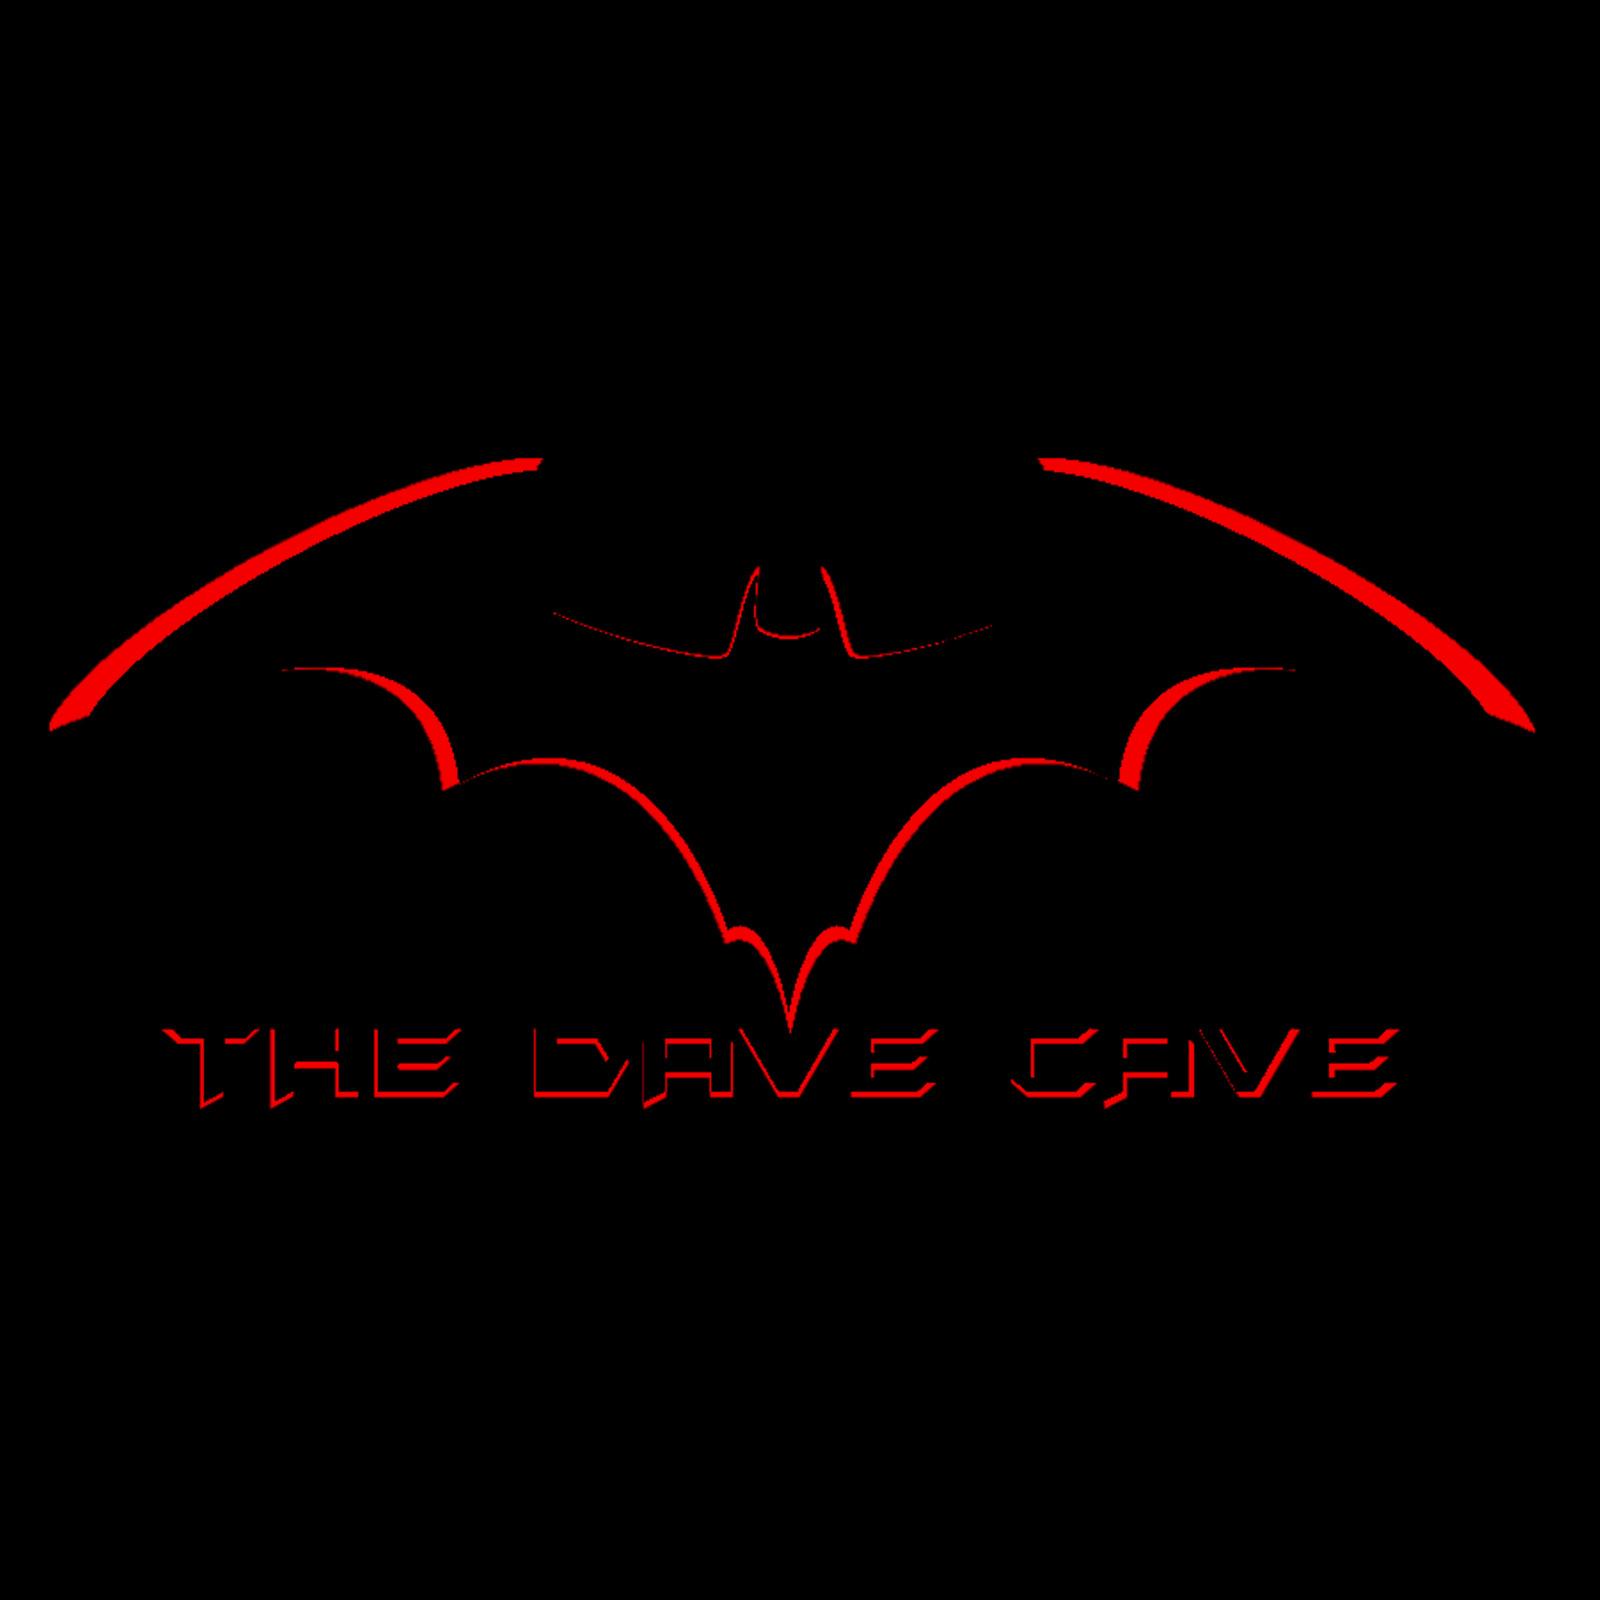 The Dave Cave Batman Podcast